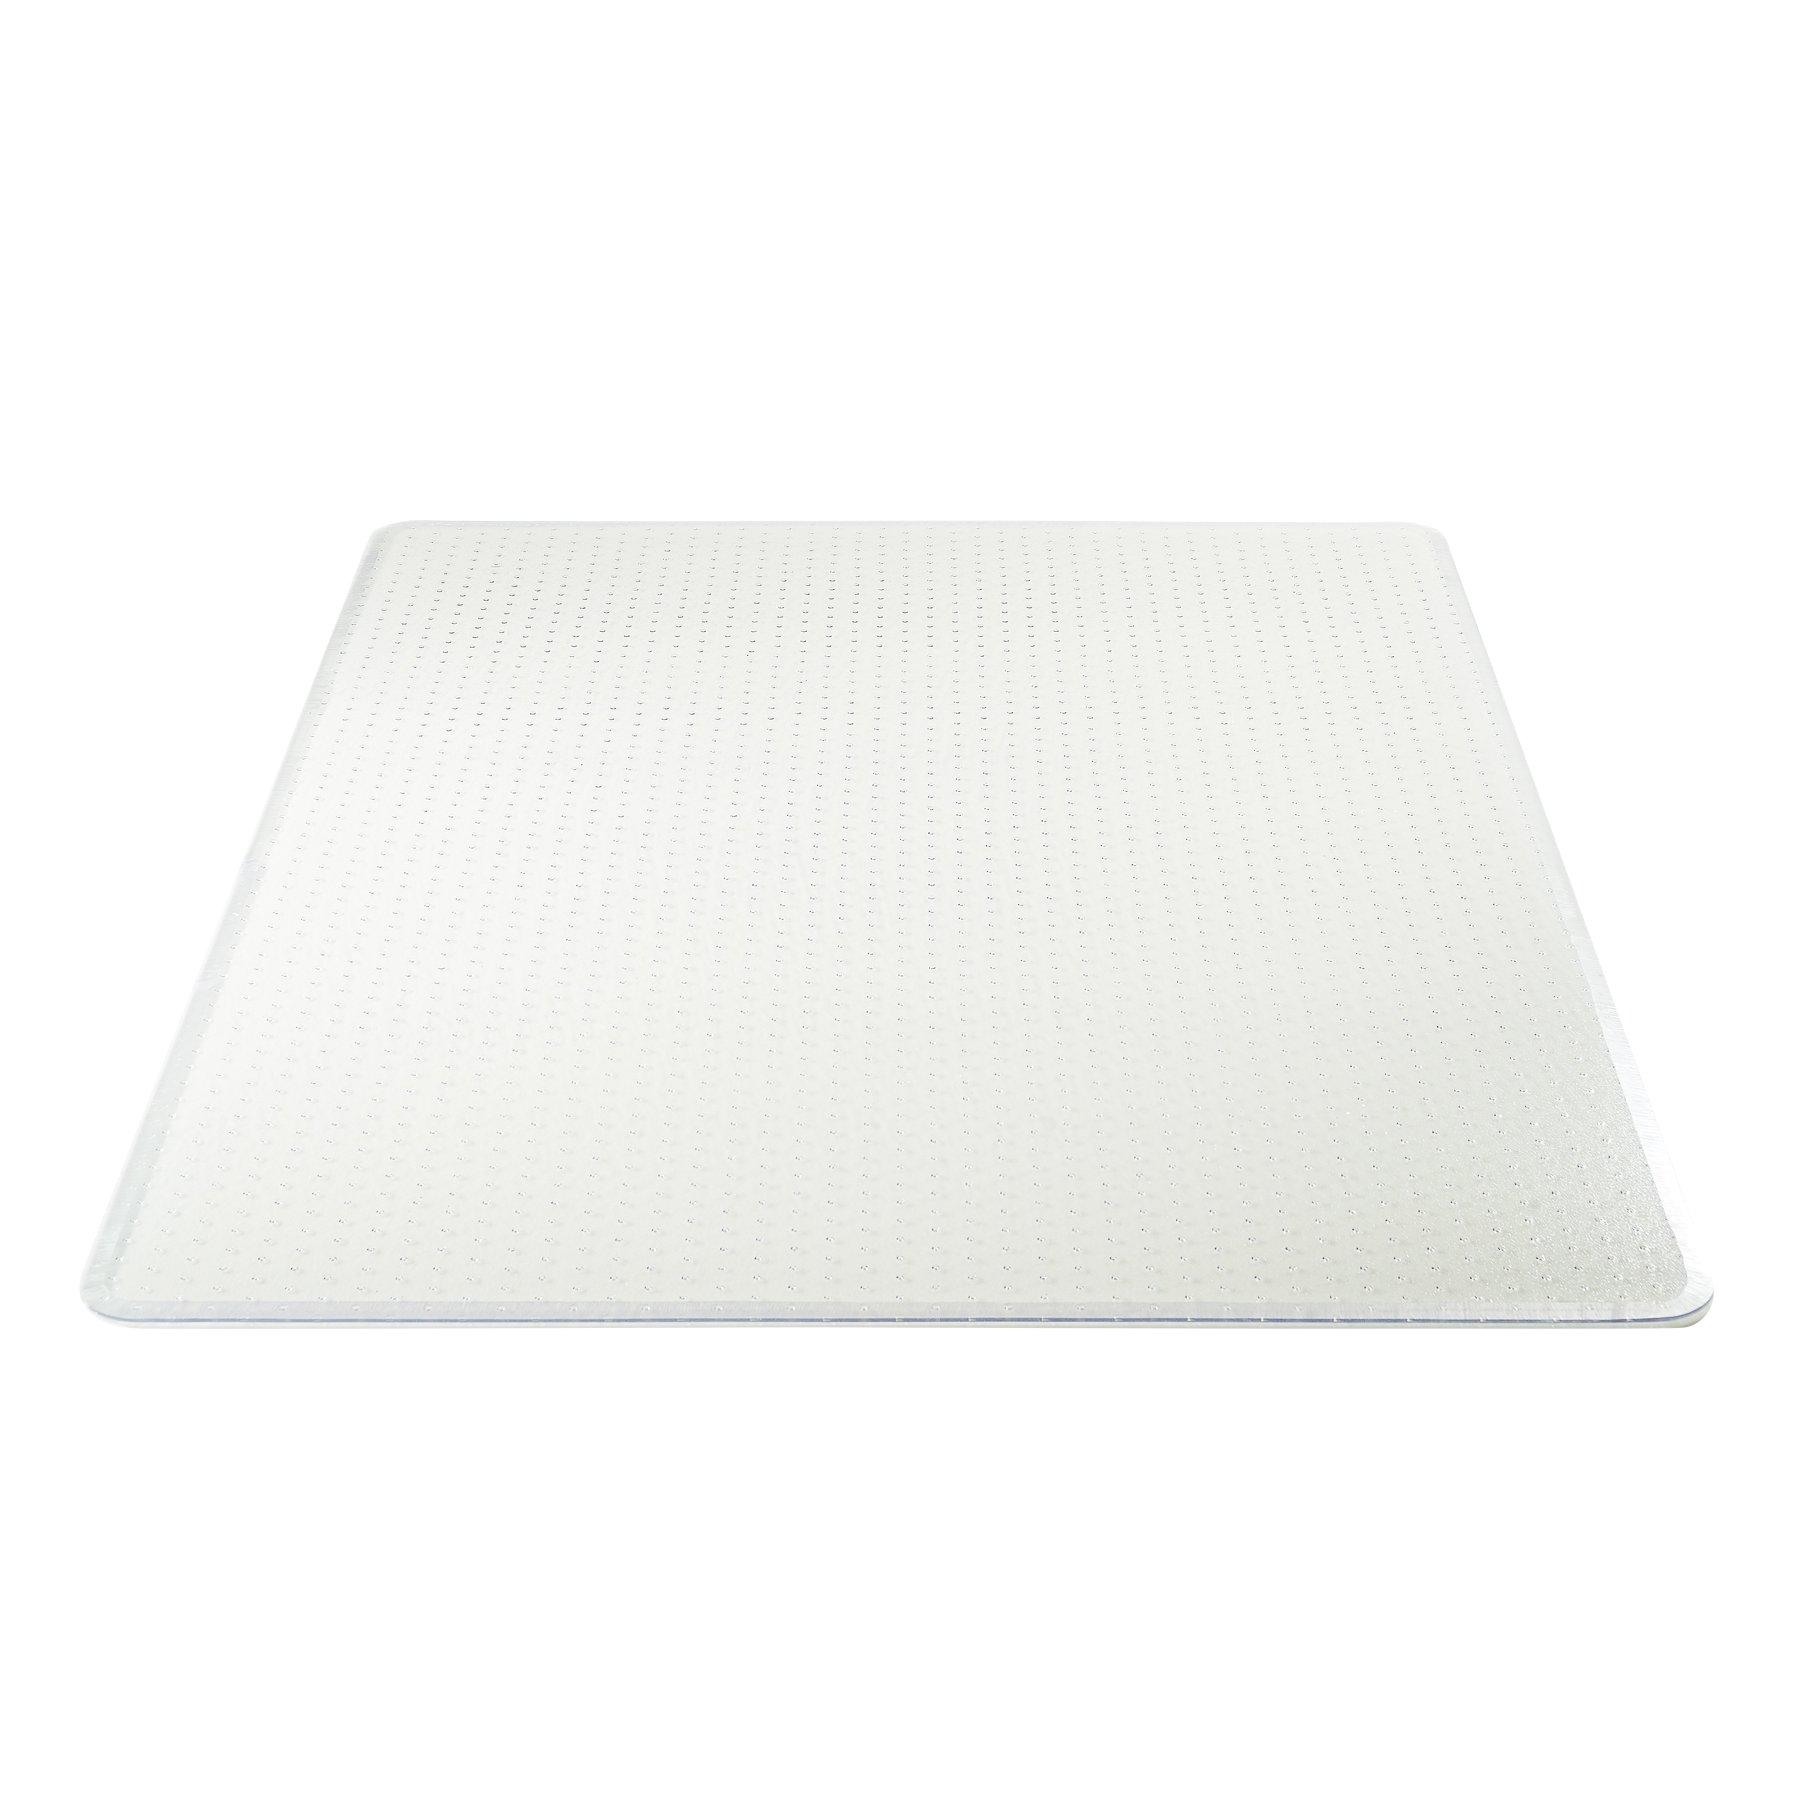 Deflecto Execumat Clear Chair Mat, High Pile Carpet Use, Rectangle, Beveled Edge, 45'' x 60'', Clear (CM17443FCOM) by Deflecto